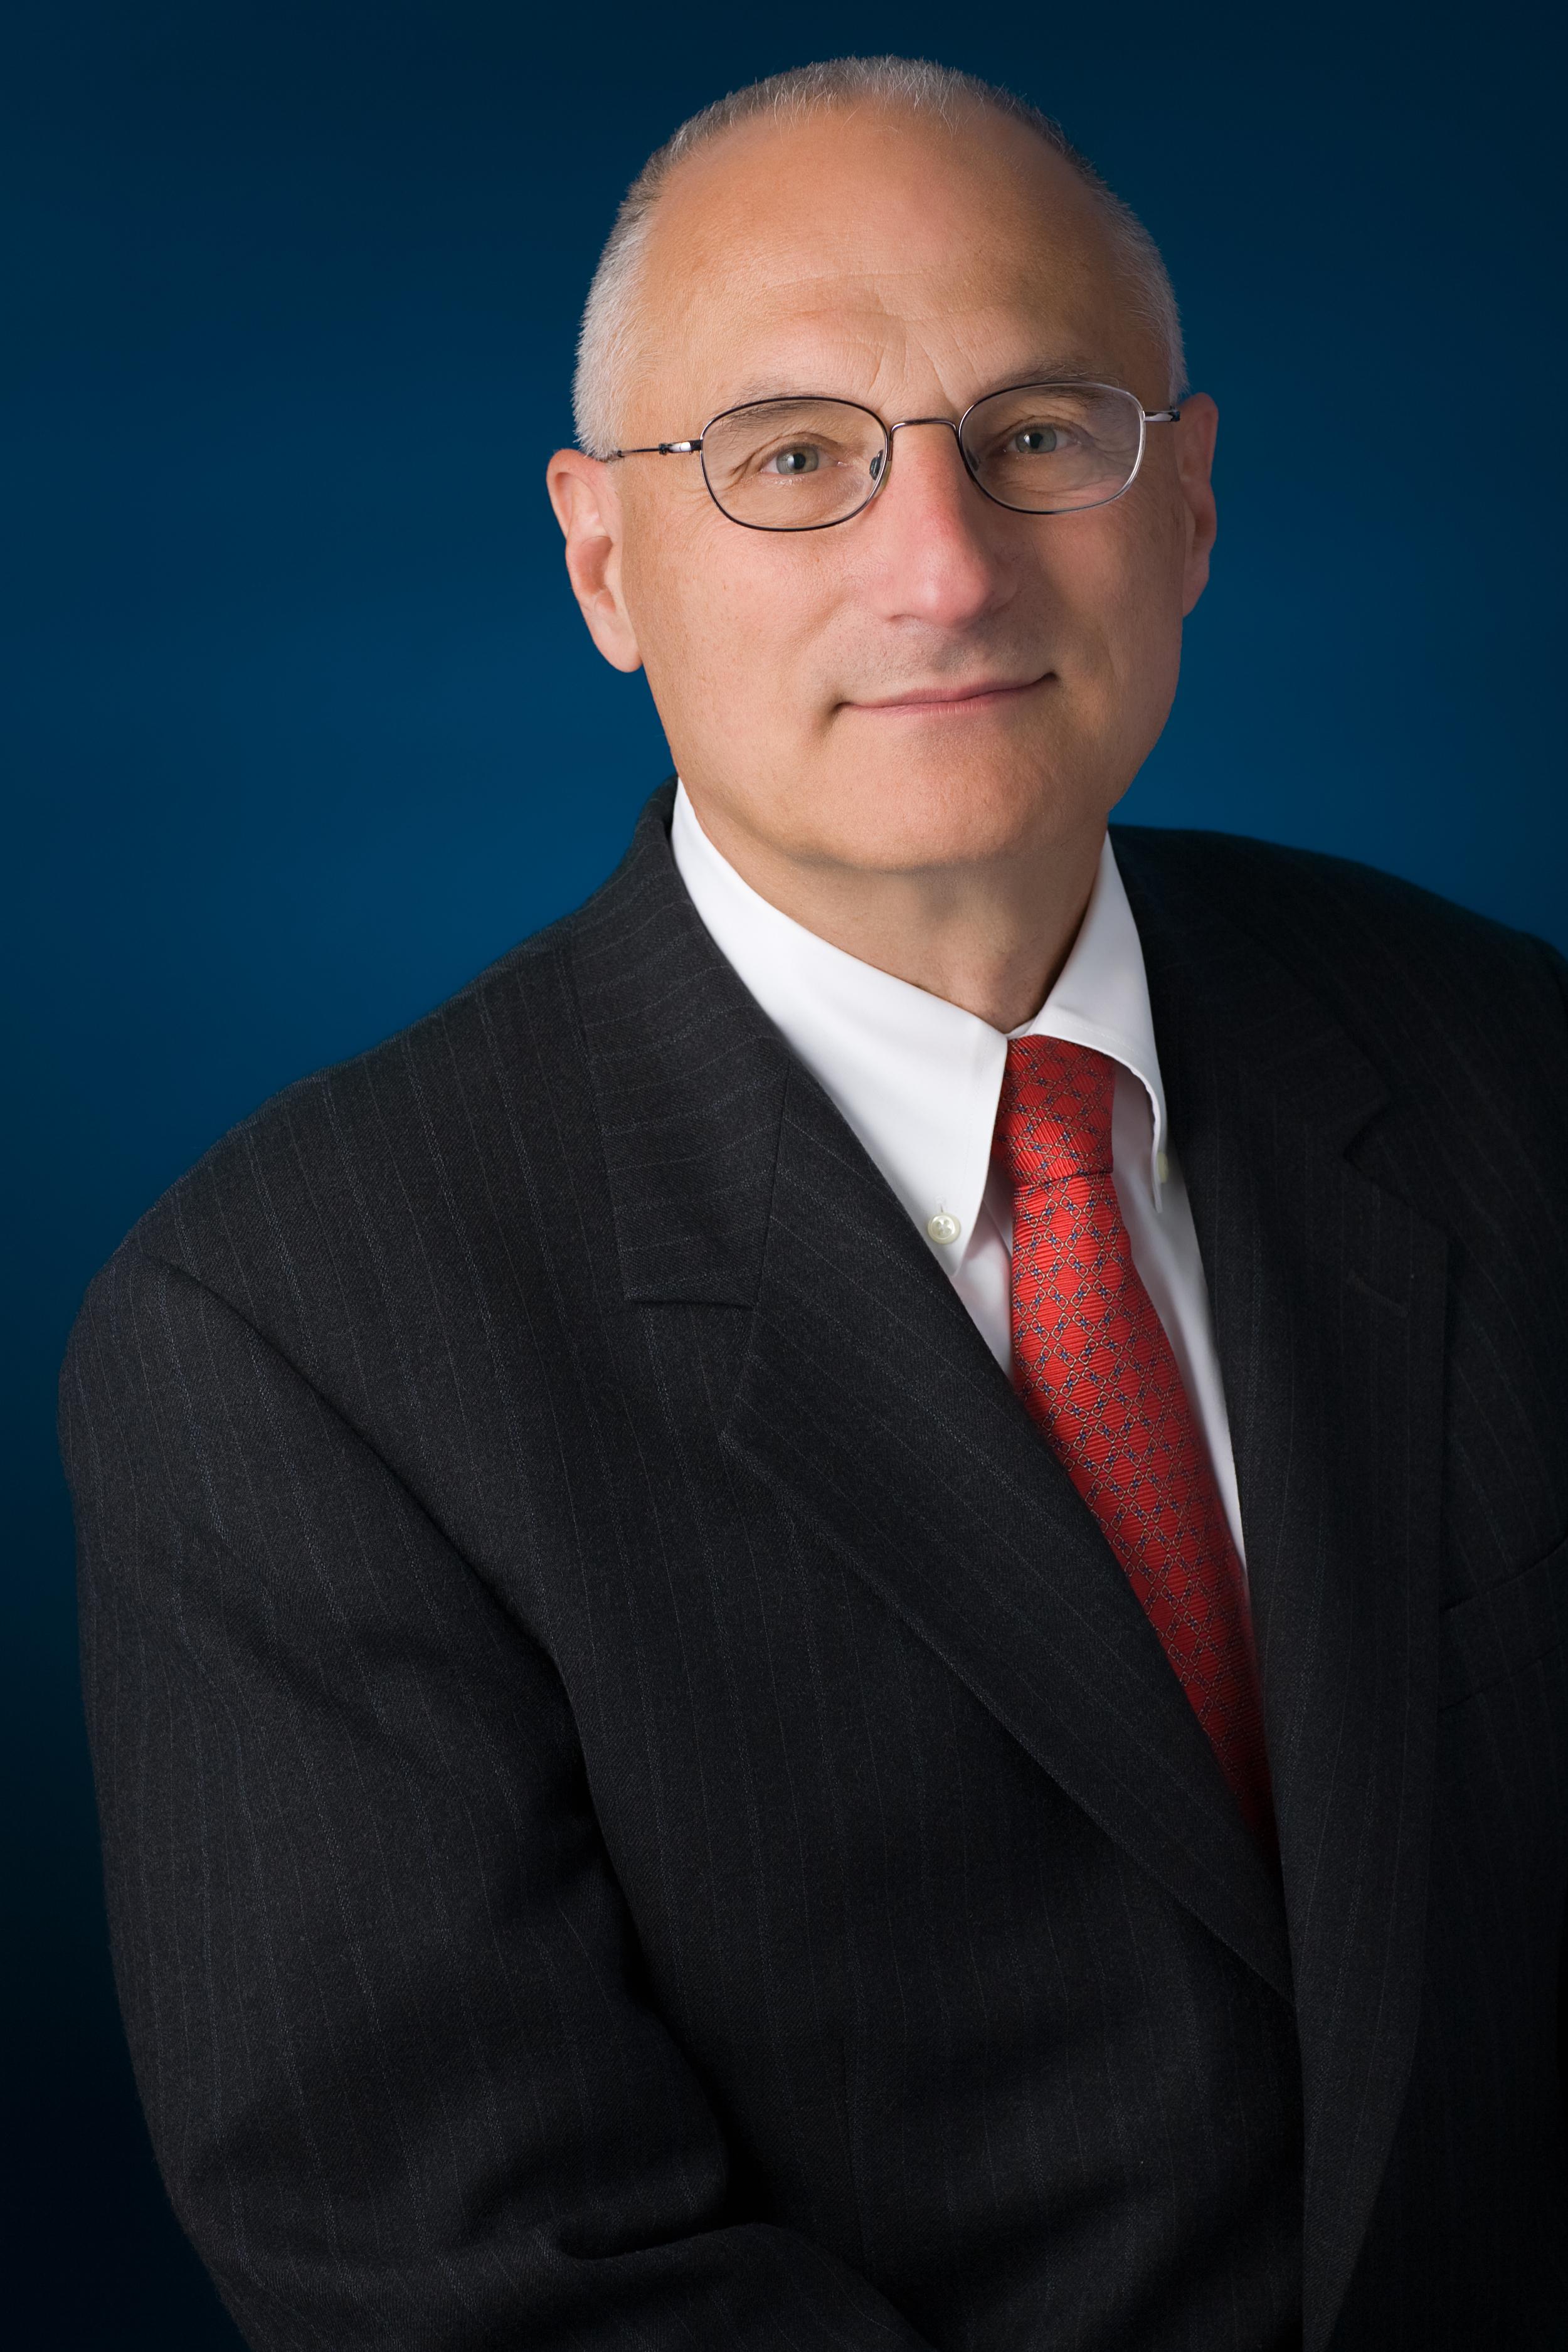 Dr. Richard Chait, Harvard Graduate School of Education